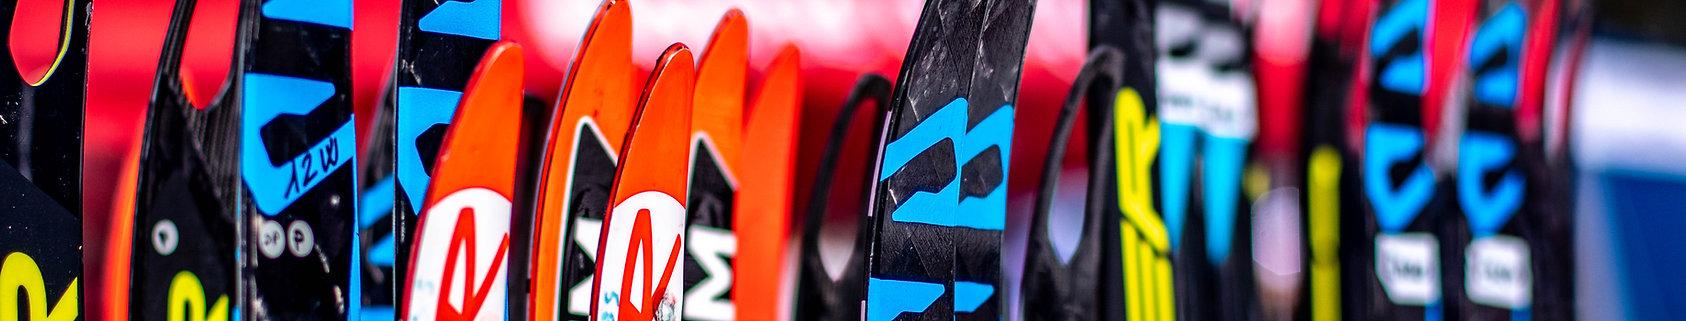 France de ski nordique (2019-03-30)-73.jpg